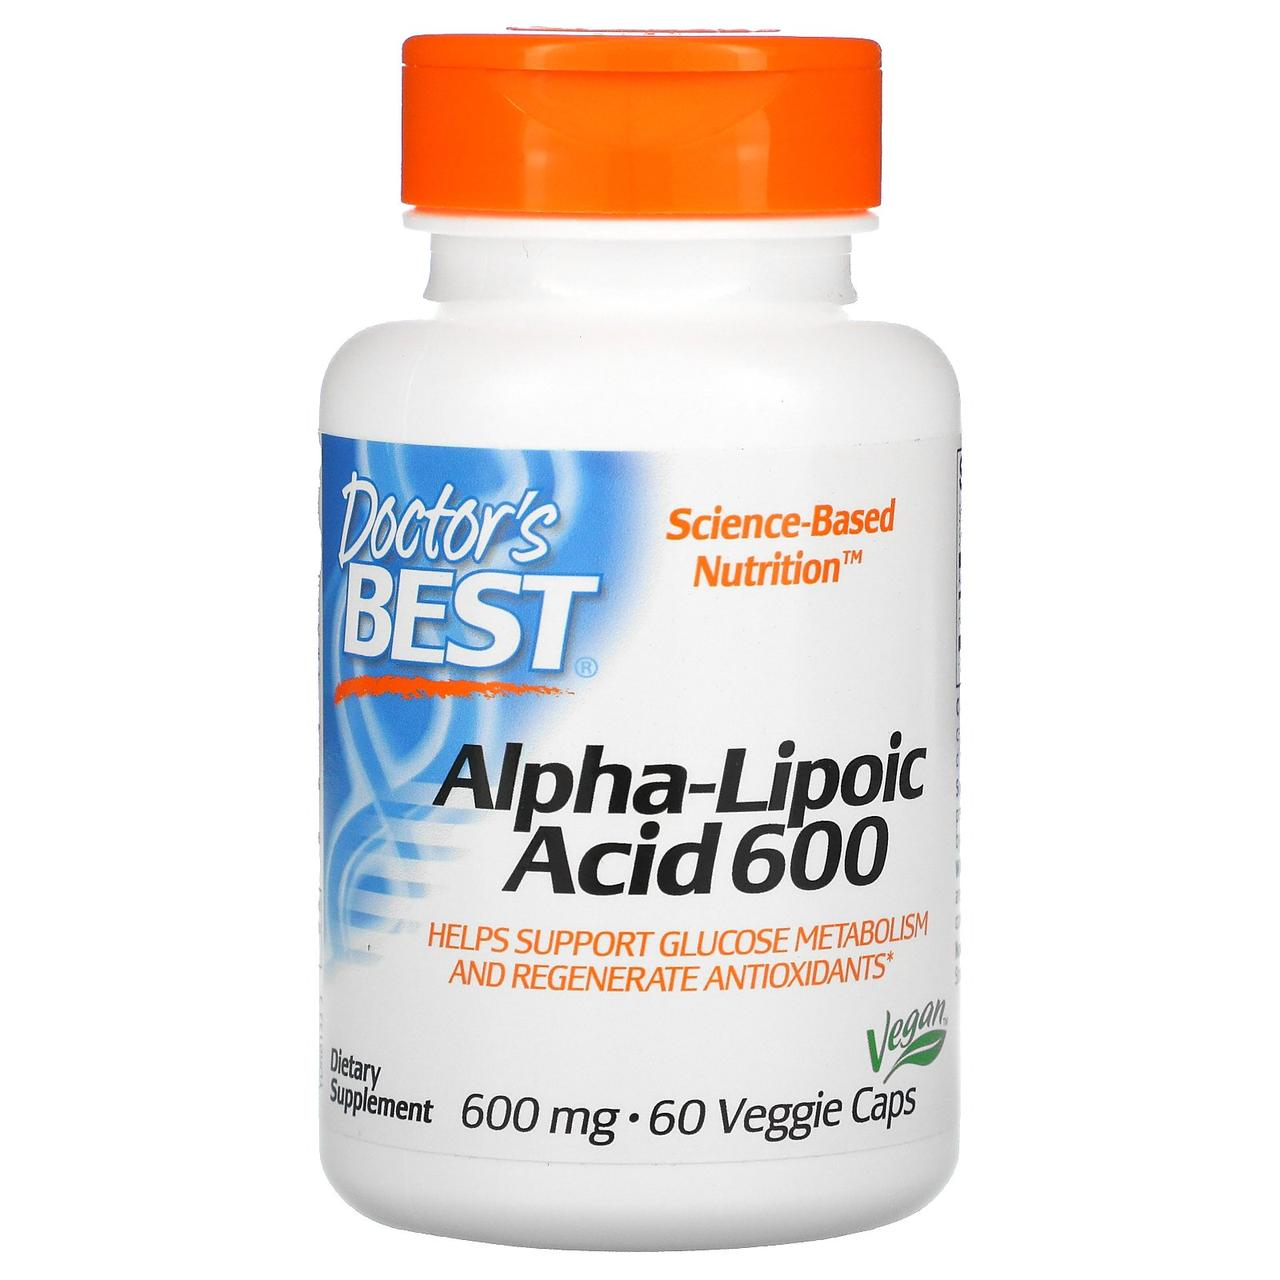 Альфа-ліпоєва кислота, 150 мг, 120 рослинних капсул, Doctor's s Best